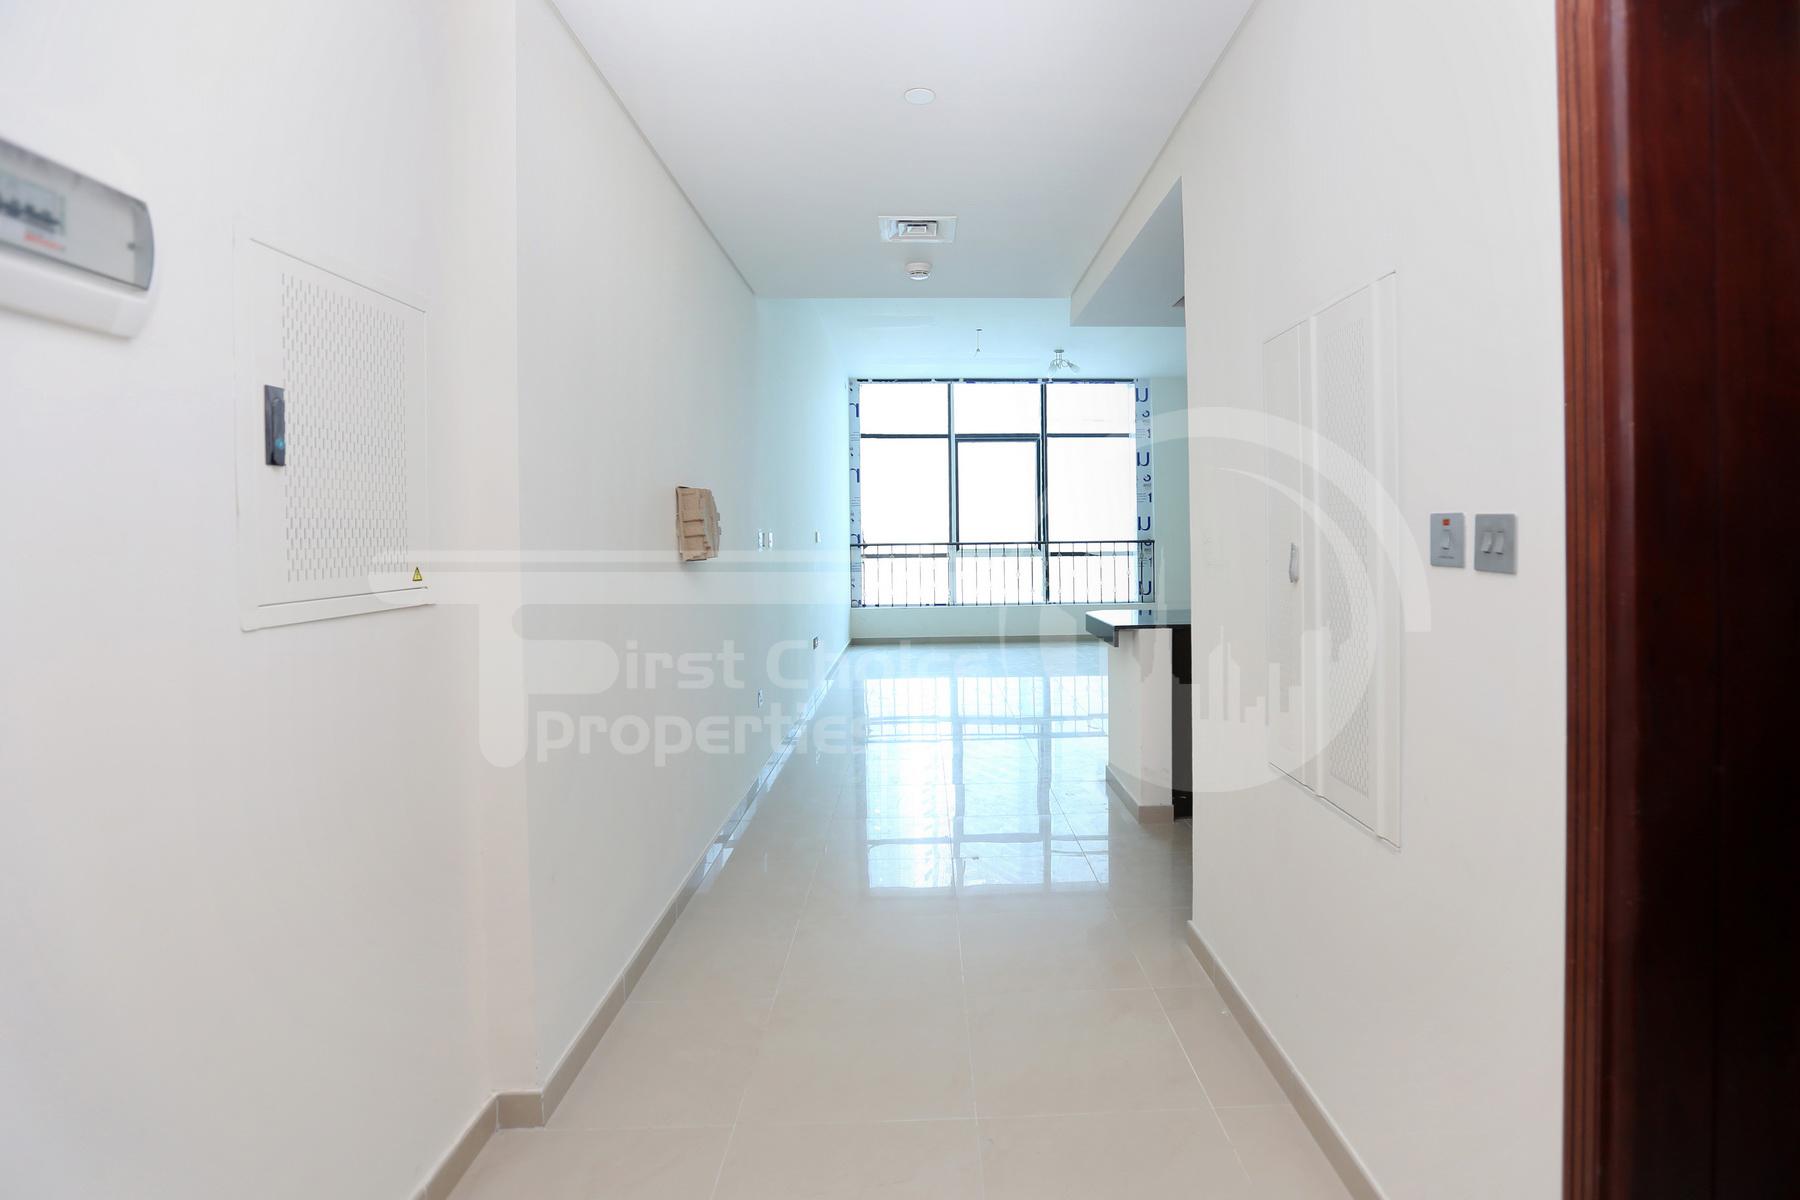 Studio Apartment - Abu Dhabi - UAE - Al Reem Island - Hydra Avenue (2).JPG